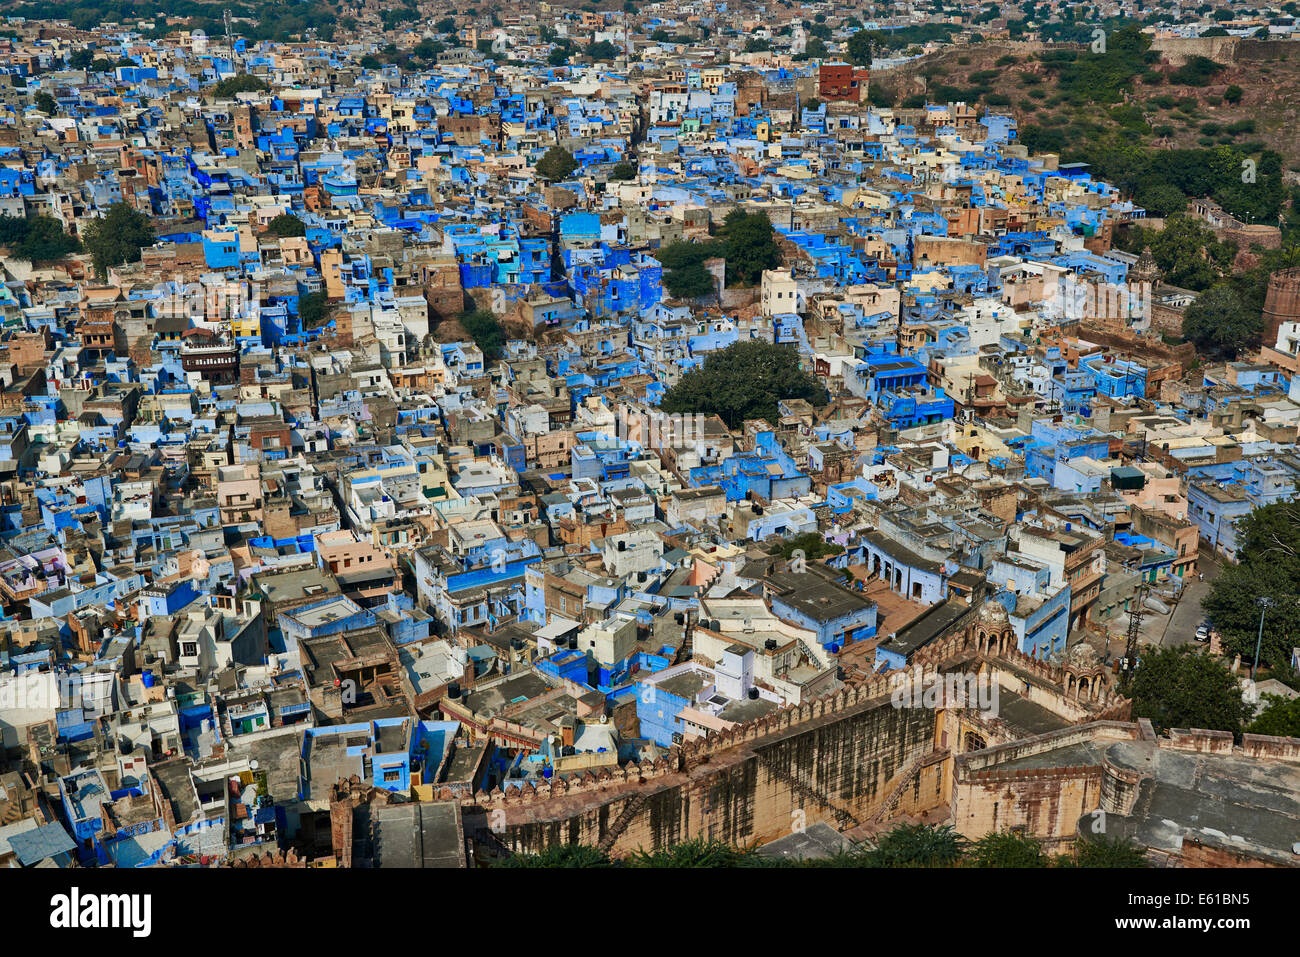 aerial view of Blue City Jodhpur, Rajasthan, India - Stock Image